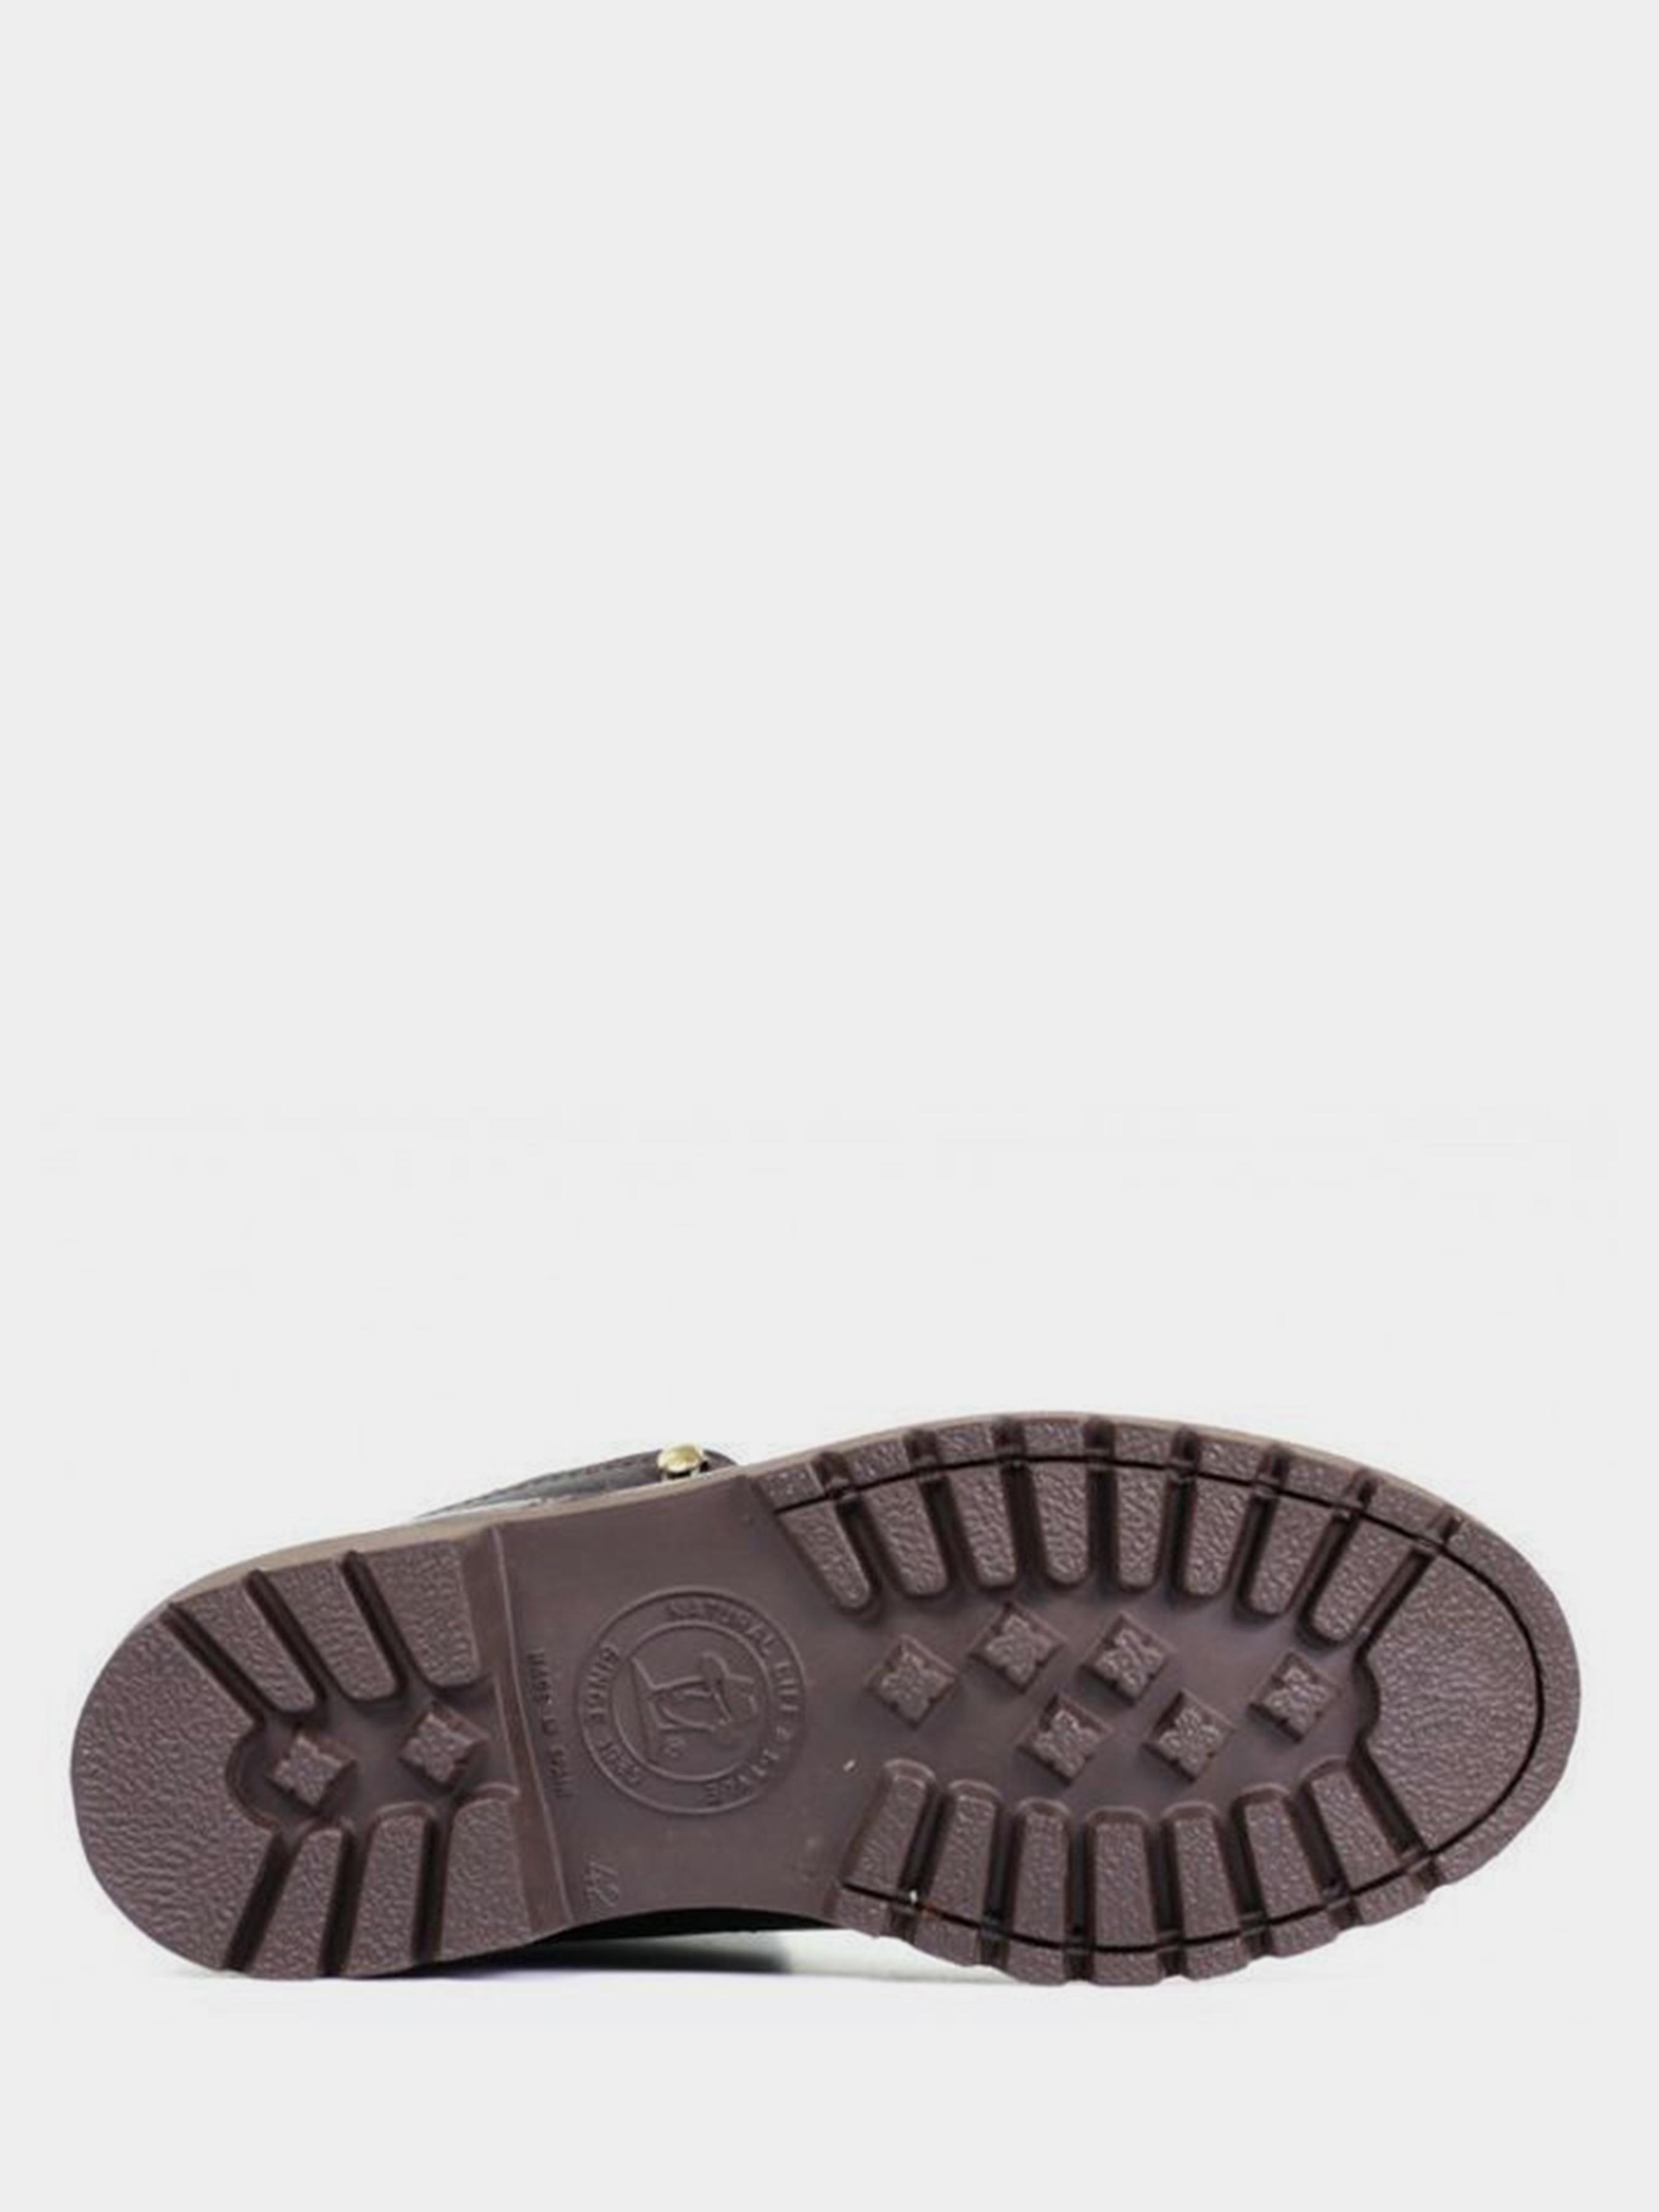 Ботинки для мужчин Panama Jack PX76 стоимость, 2017